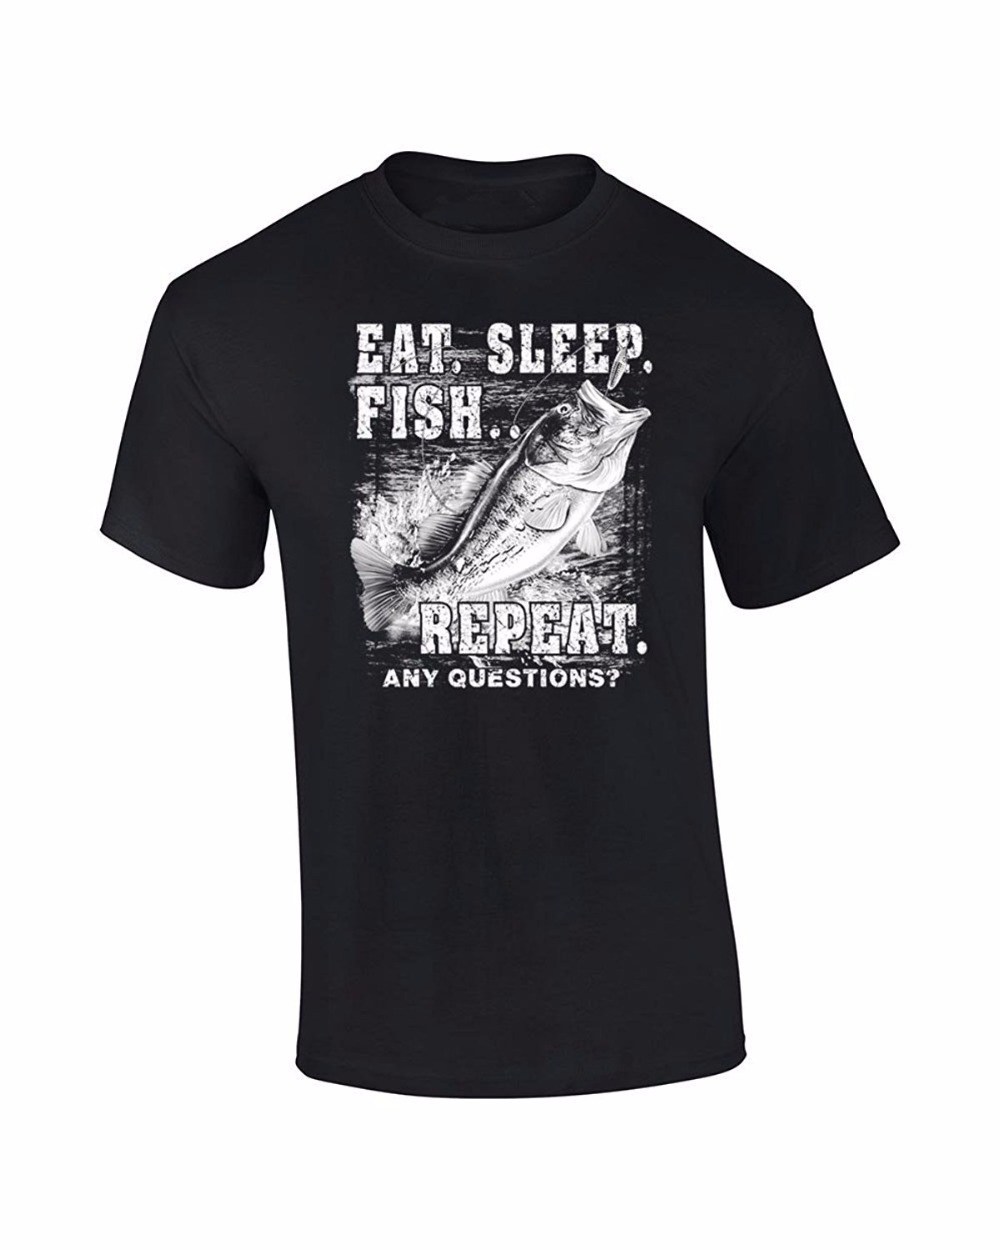 Printed T-Shirts Boys Top Tee Shirt Cotton New Metal Short Sleeve Casual Shirt Fishings T-Shirt Eat Sleep Fish Repeat T Shirt